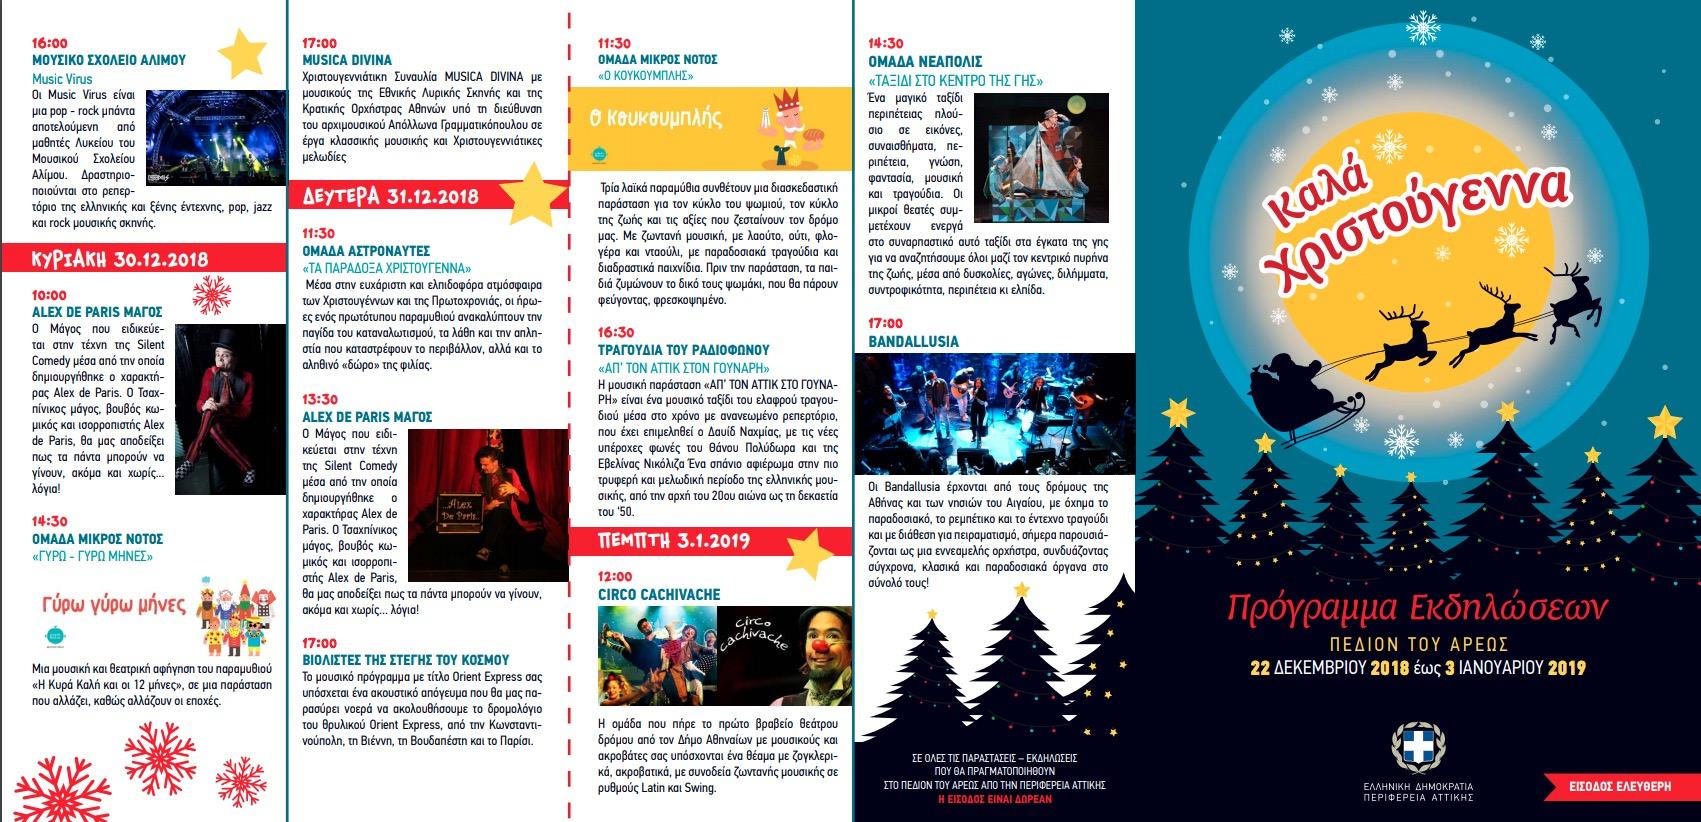 b9dab6bd07f Εορταστικές εκδηλώσεις για τα Χριστούγεννα στο Πεδίον του Άρεως